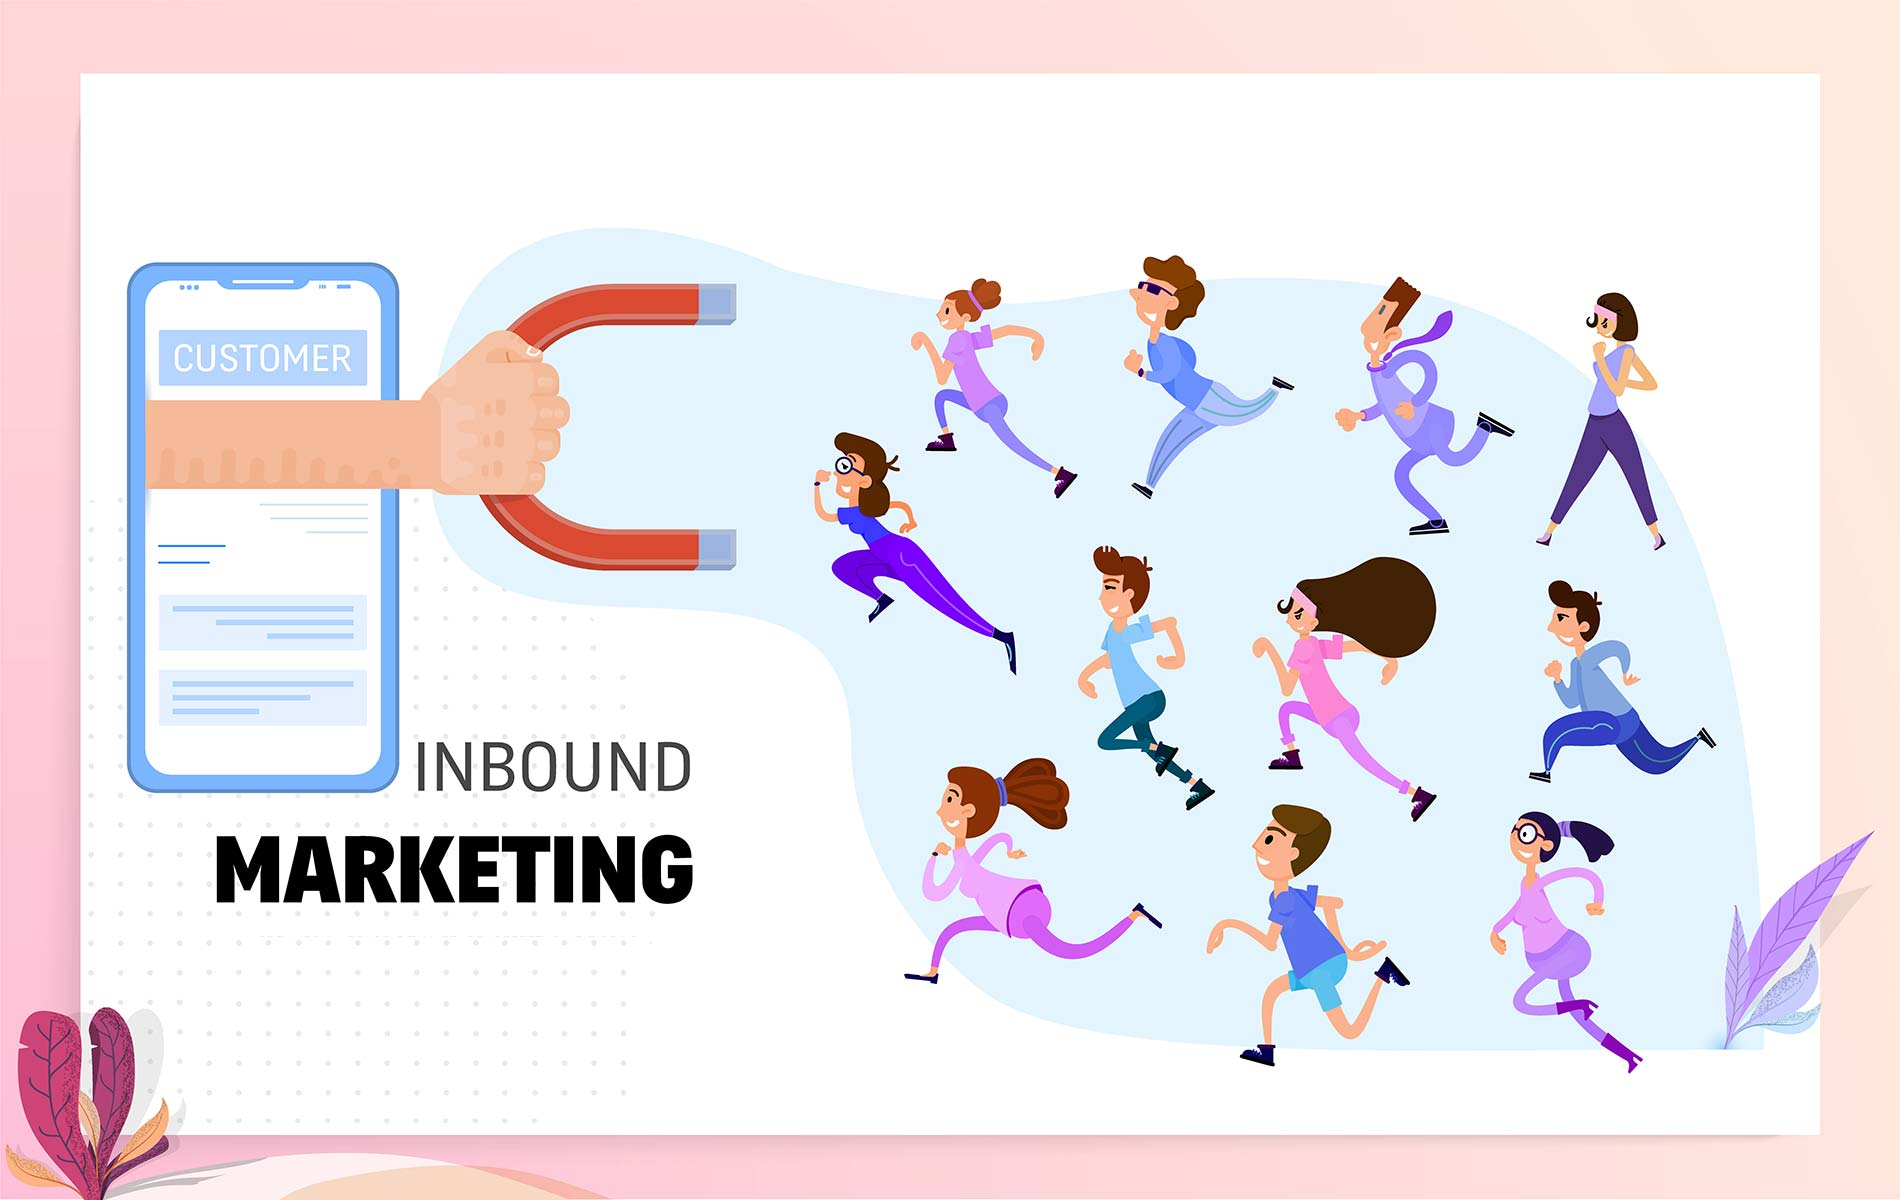 Build your Brand with inbound marketing